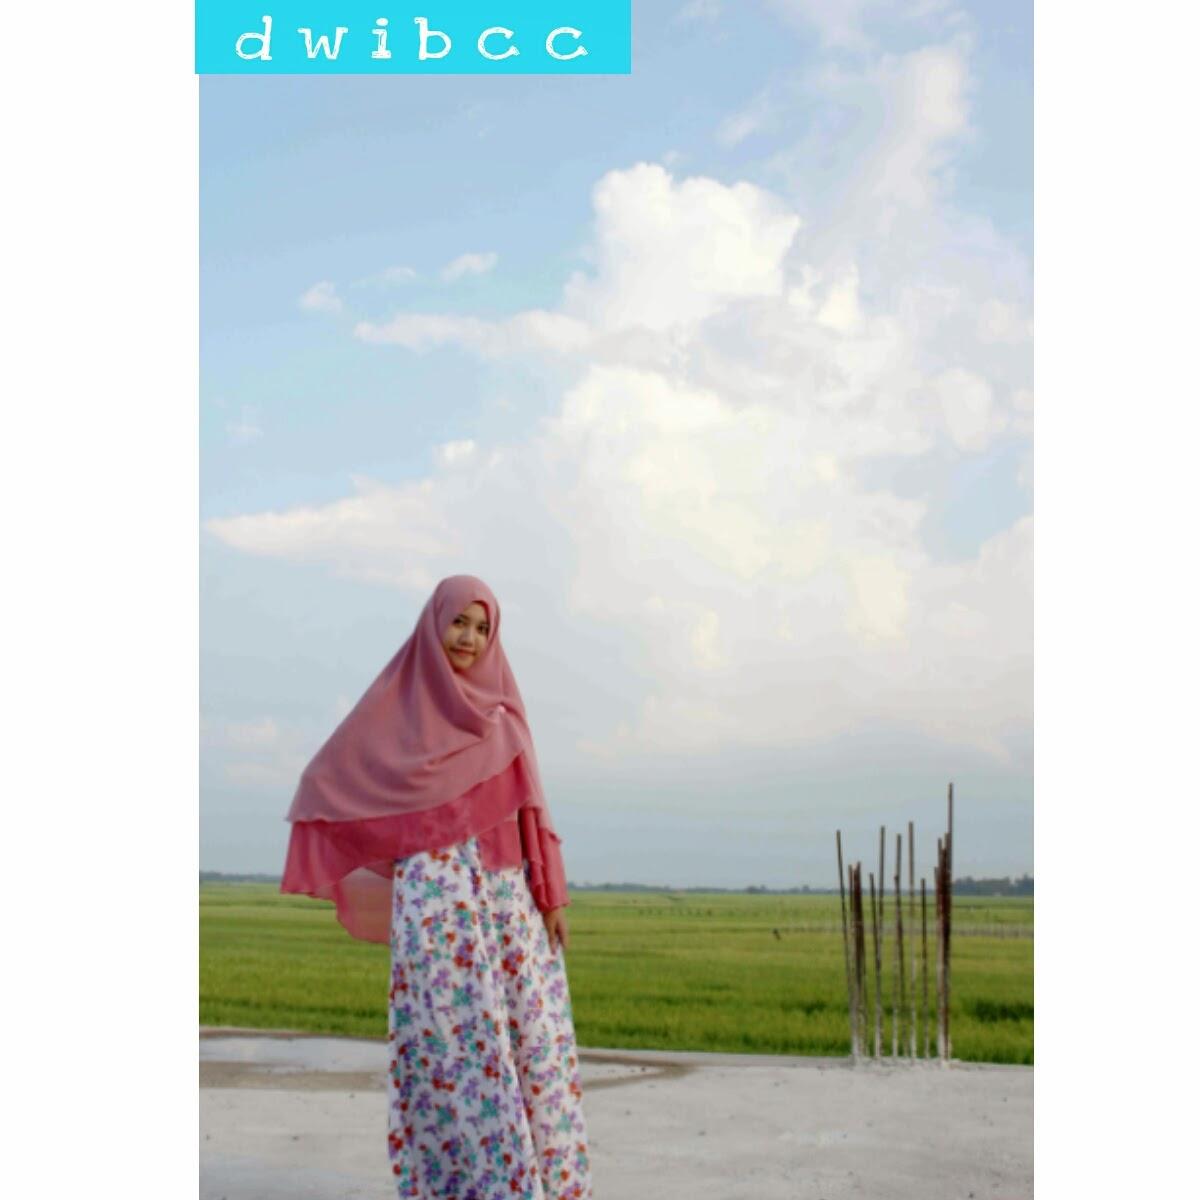 gamis dwi bcc hijab syar'i